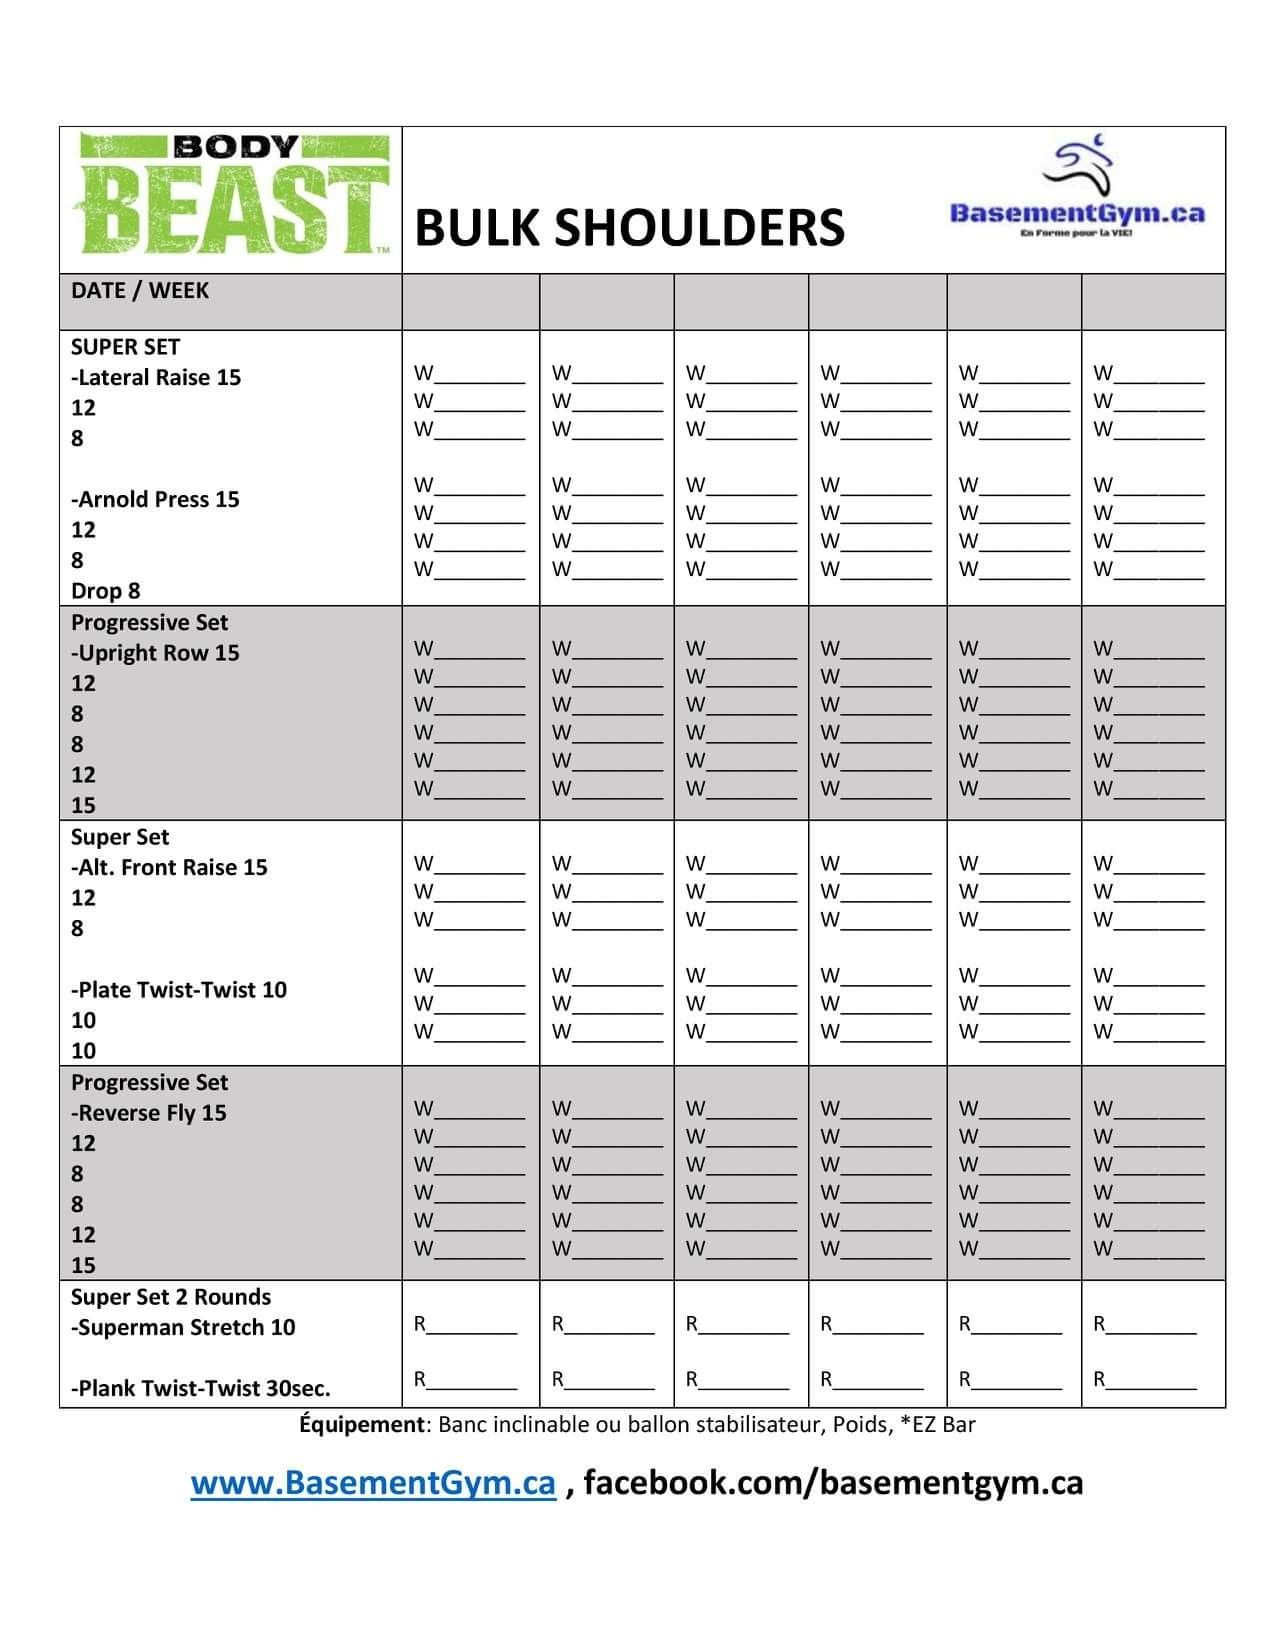 Body Beast Bulk Shoulders Worksheet